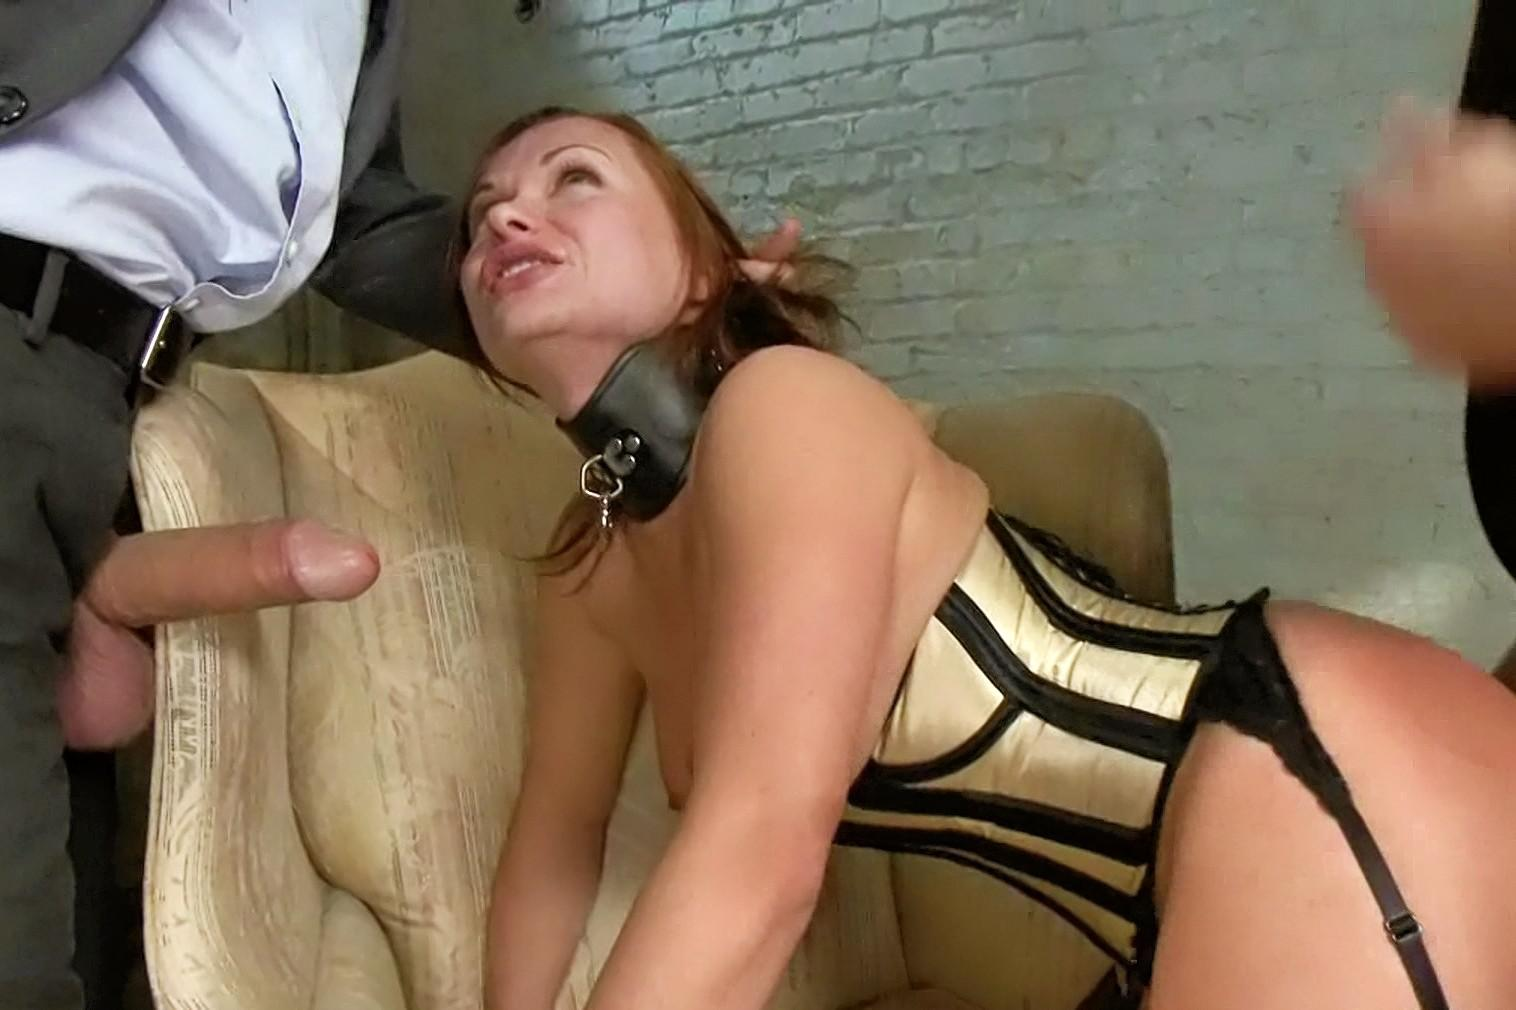 Adult Porn Bdsm bdsm bondage movie story video . adult gallery. comments: 5